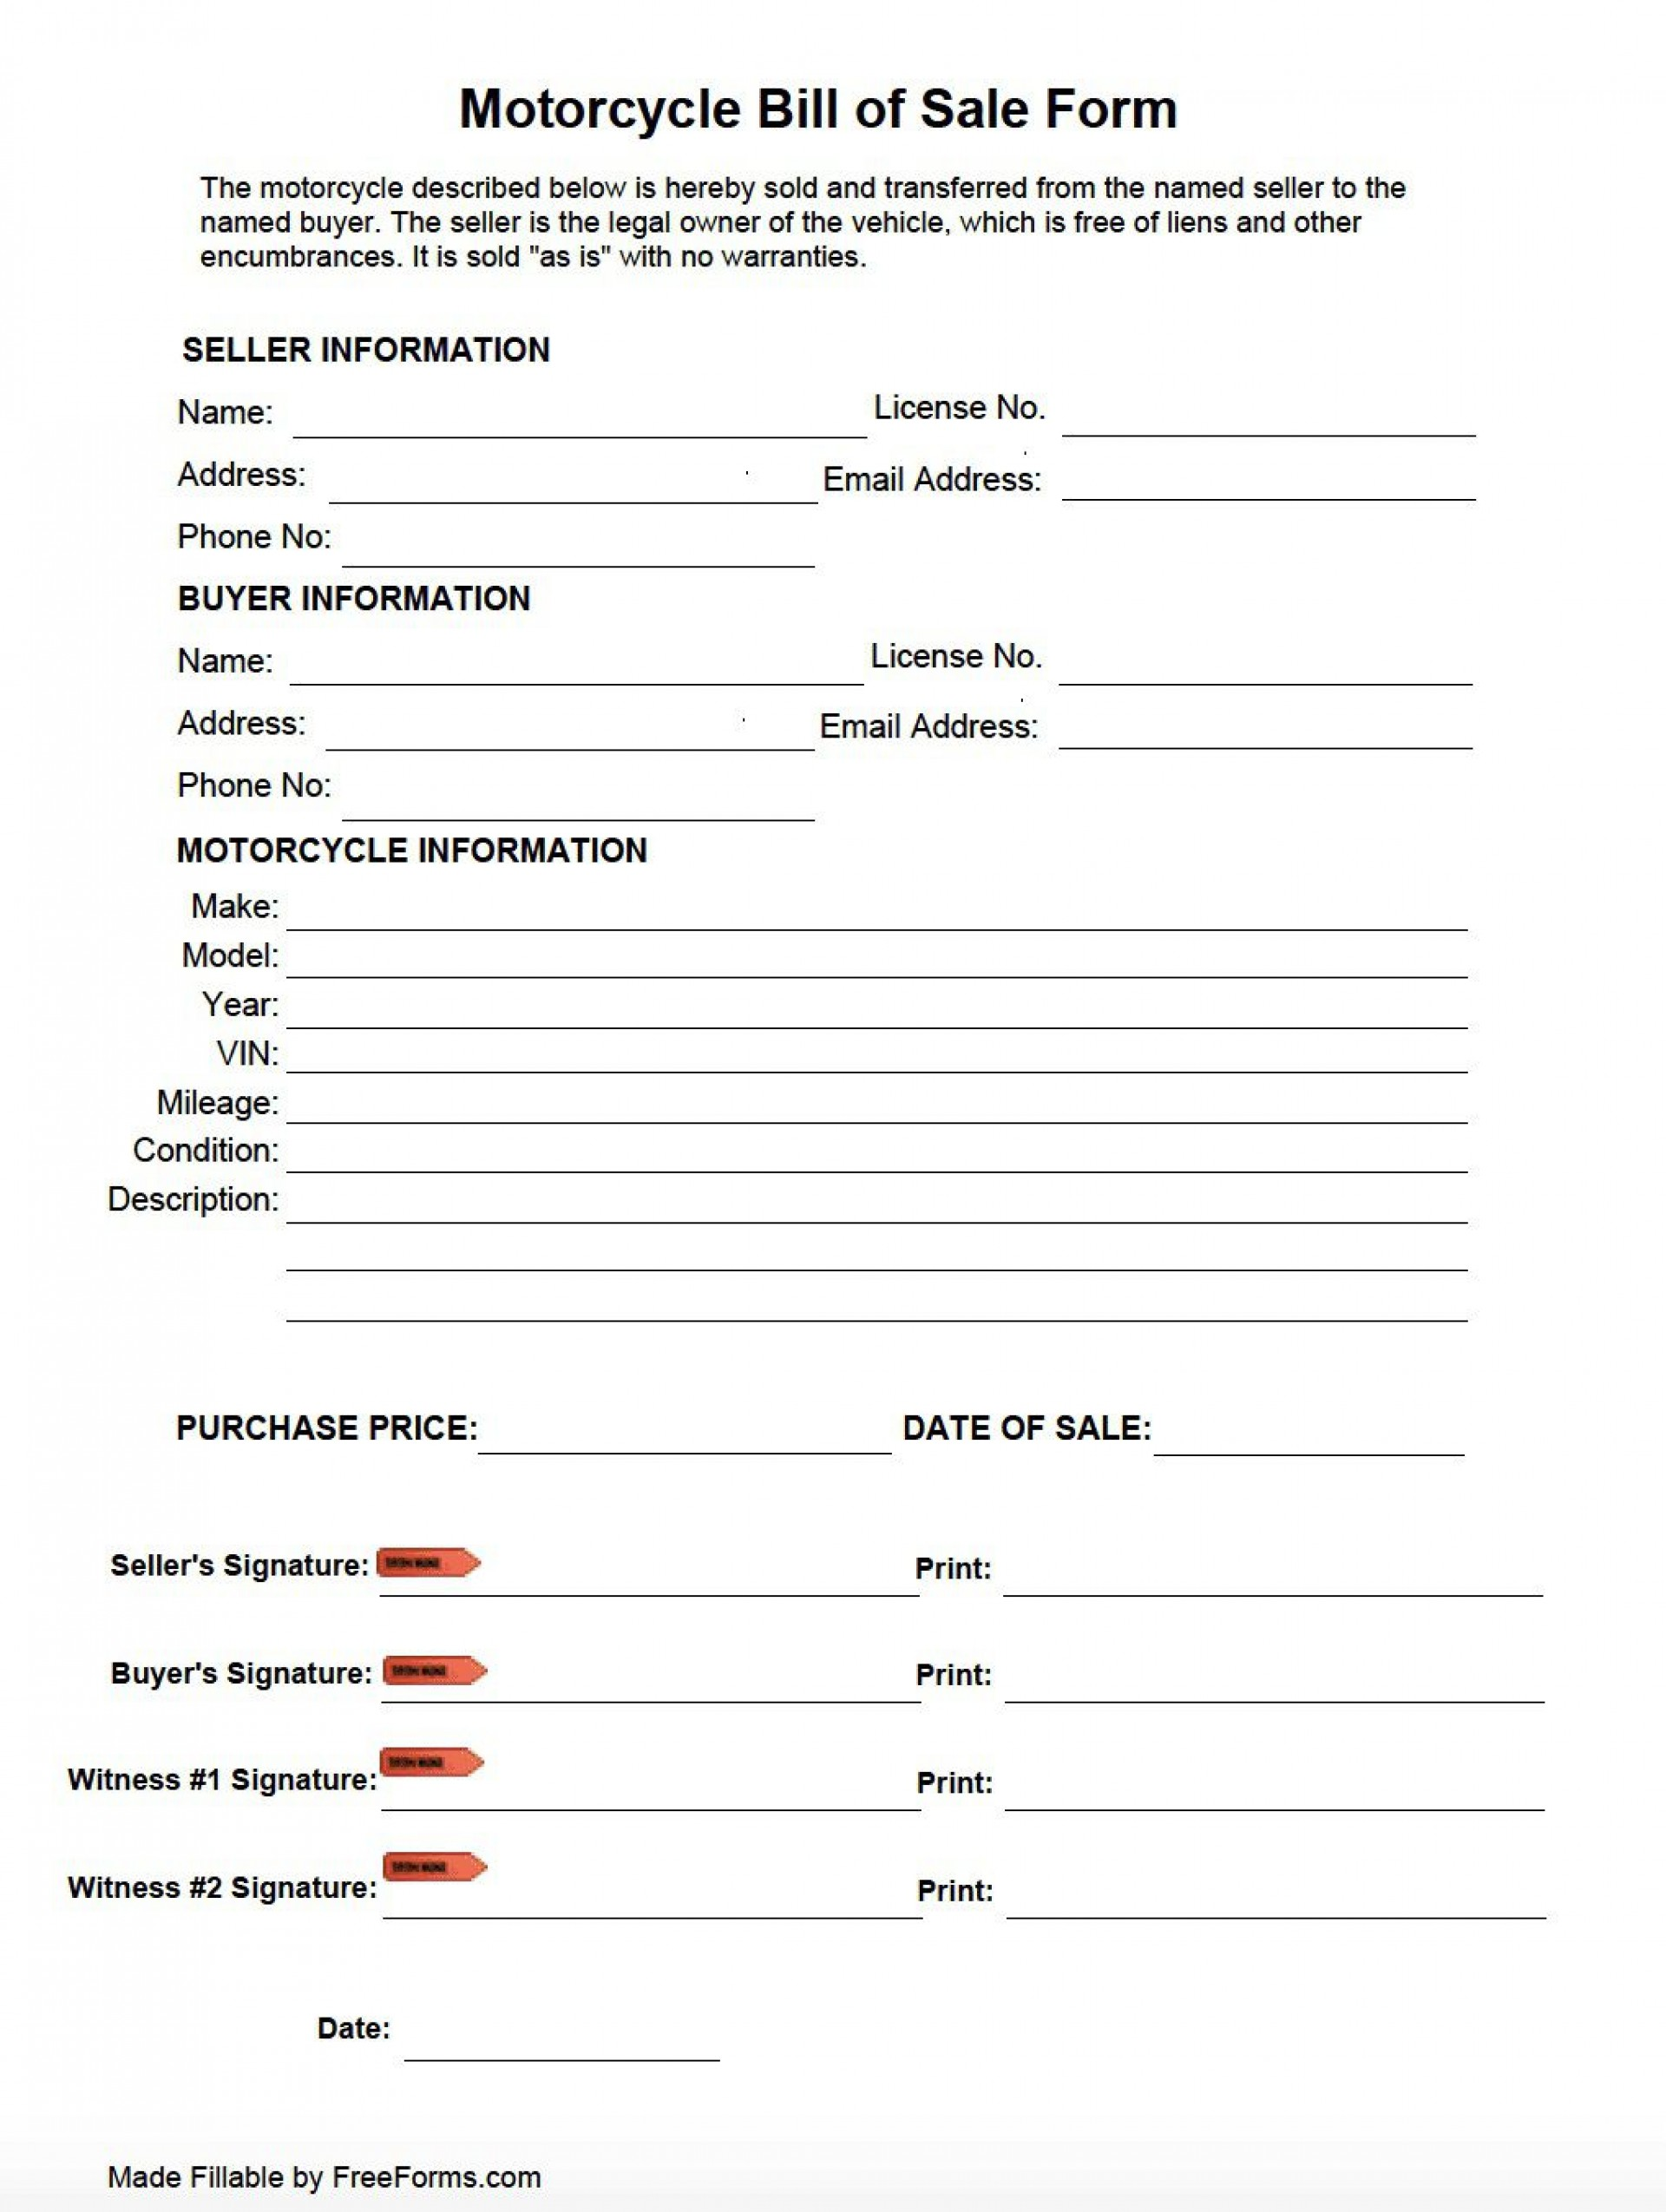 006 Incredible Motorcycle Bill Of Sale Template Image  Ontario Printable Word California1920